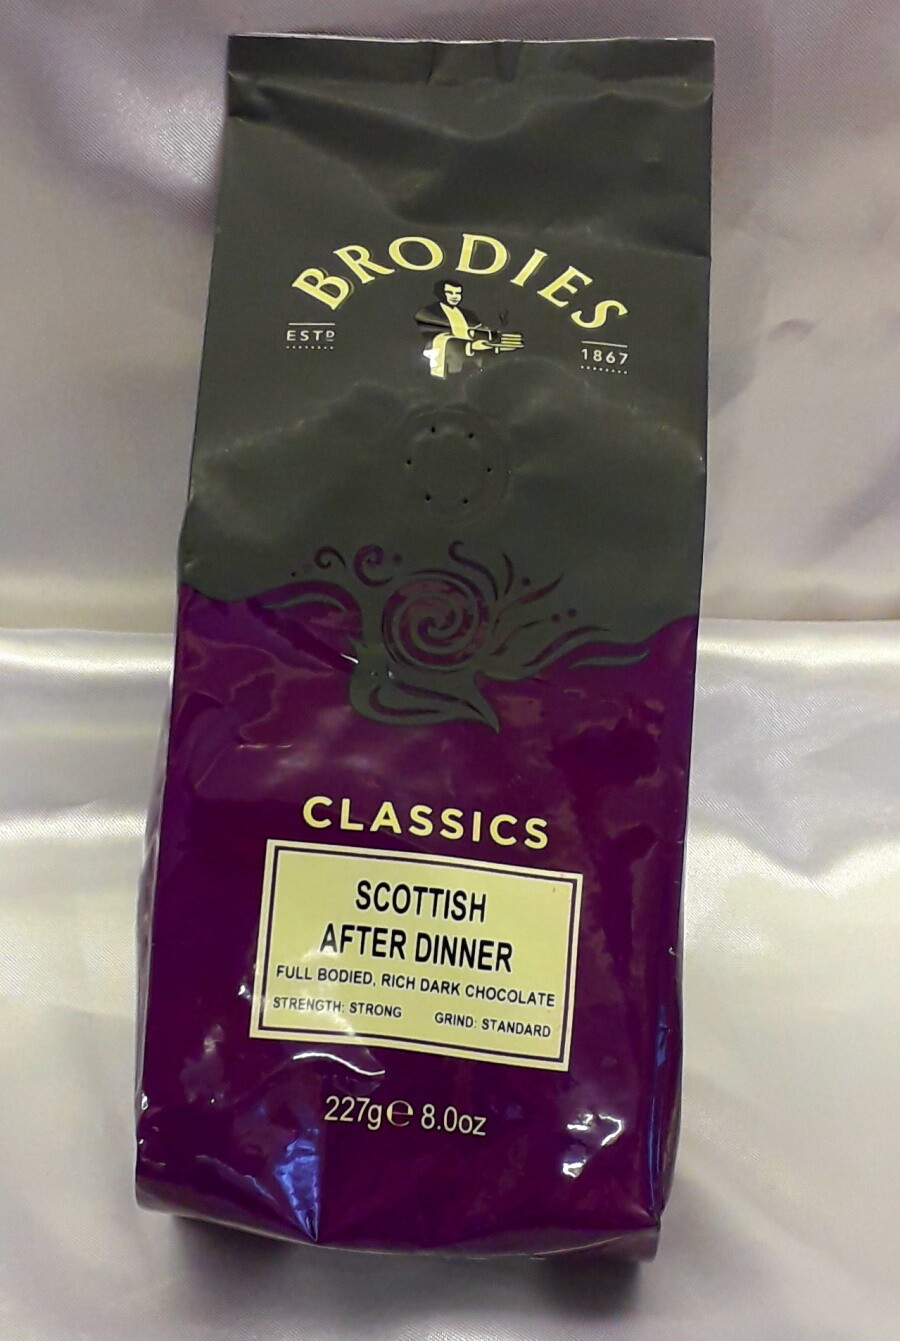 Brodies Scottish After Dinner Coffee 227g